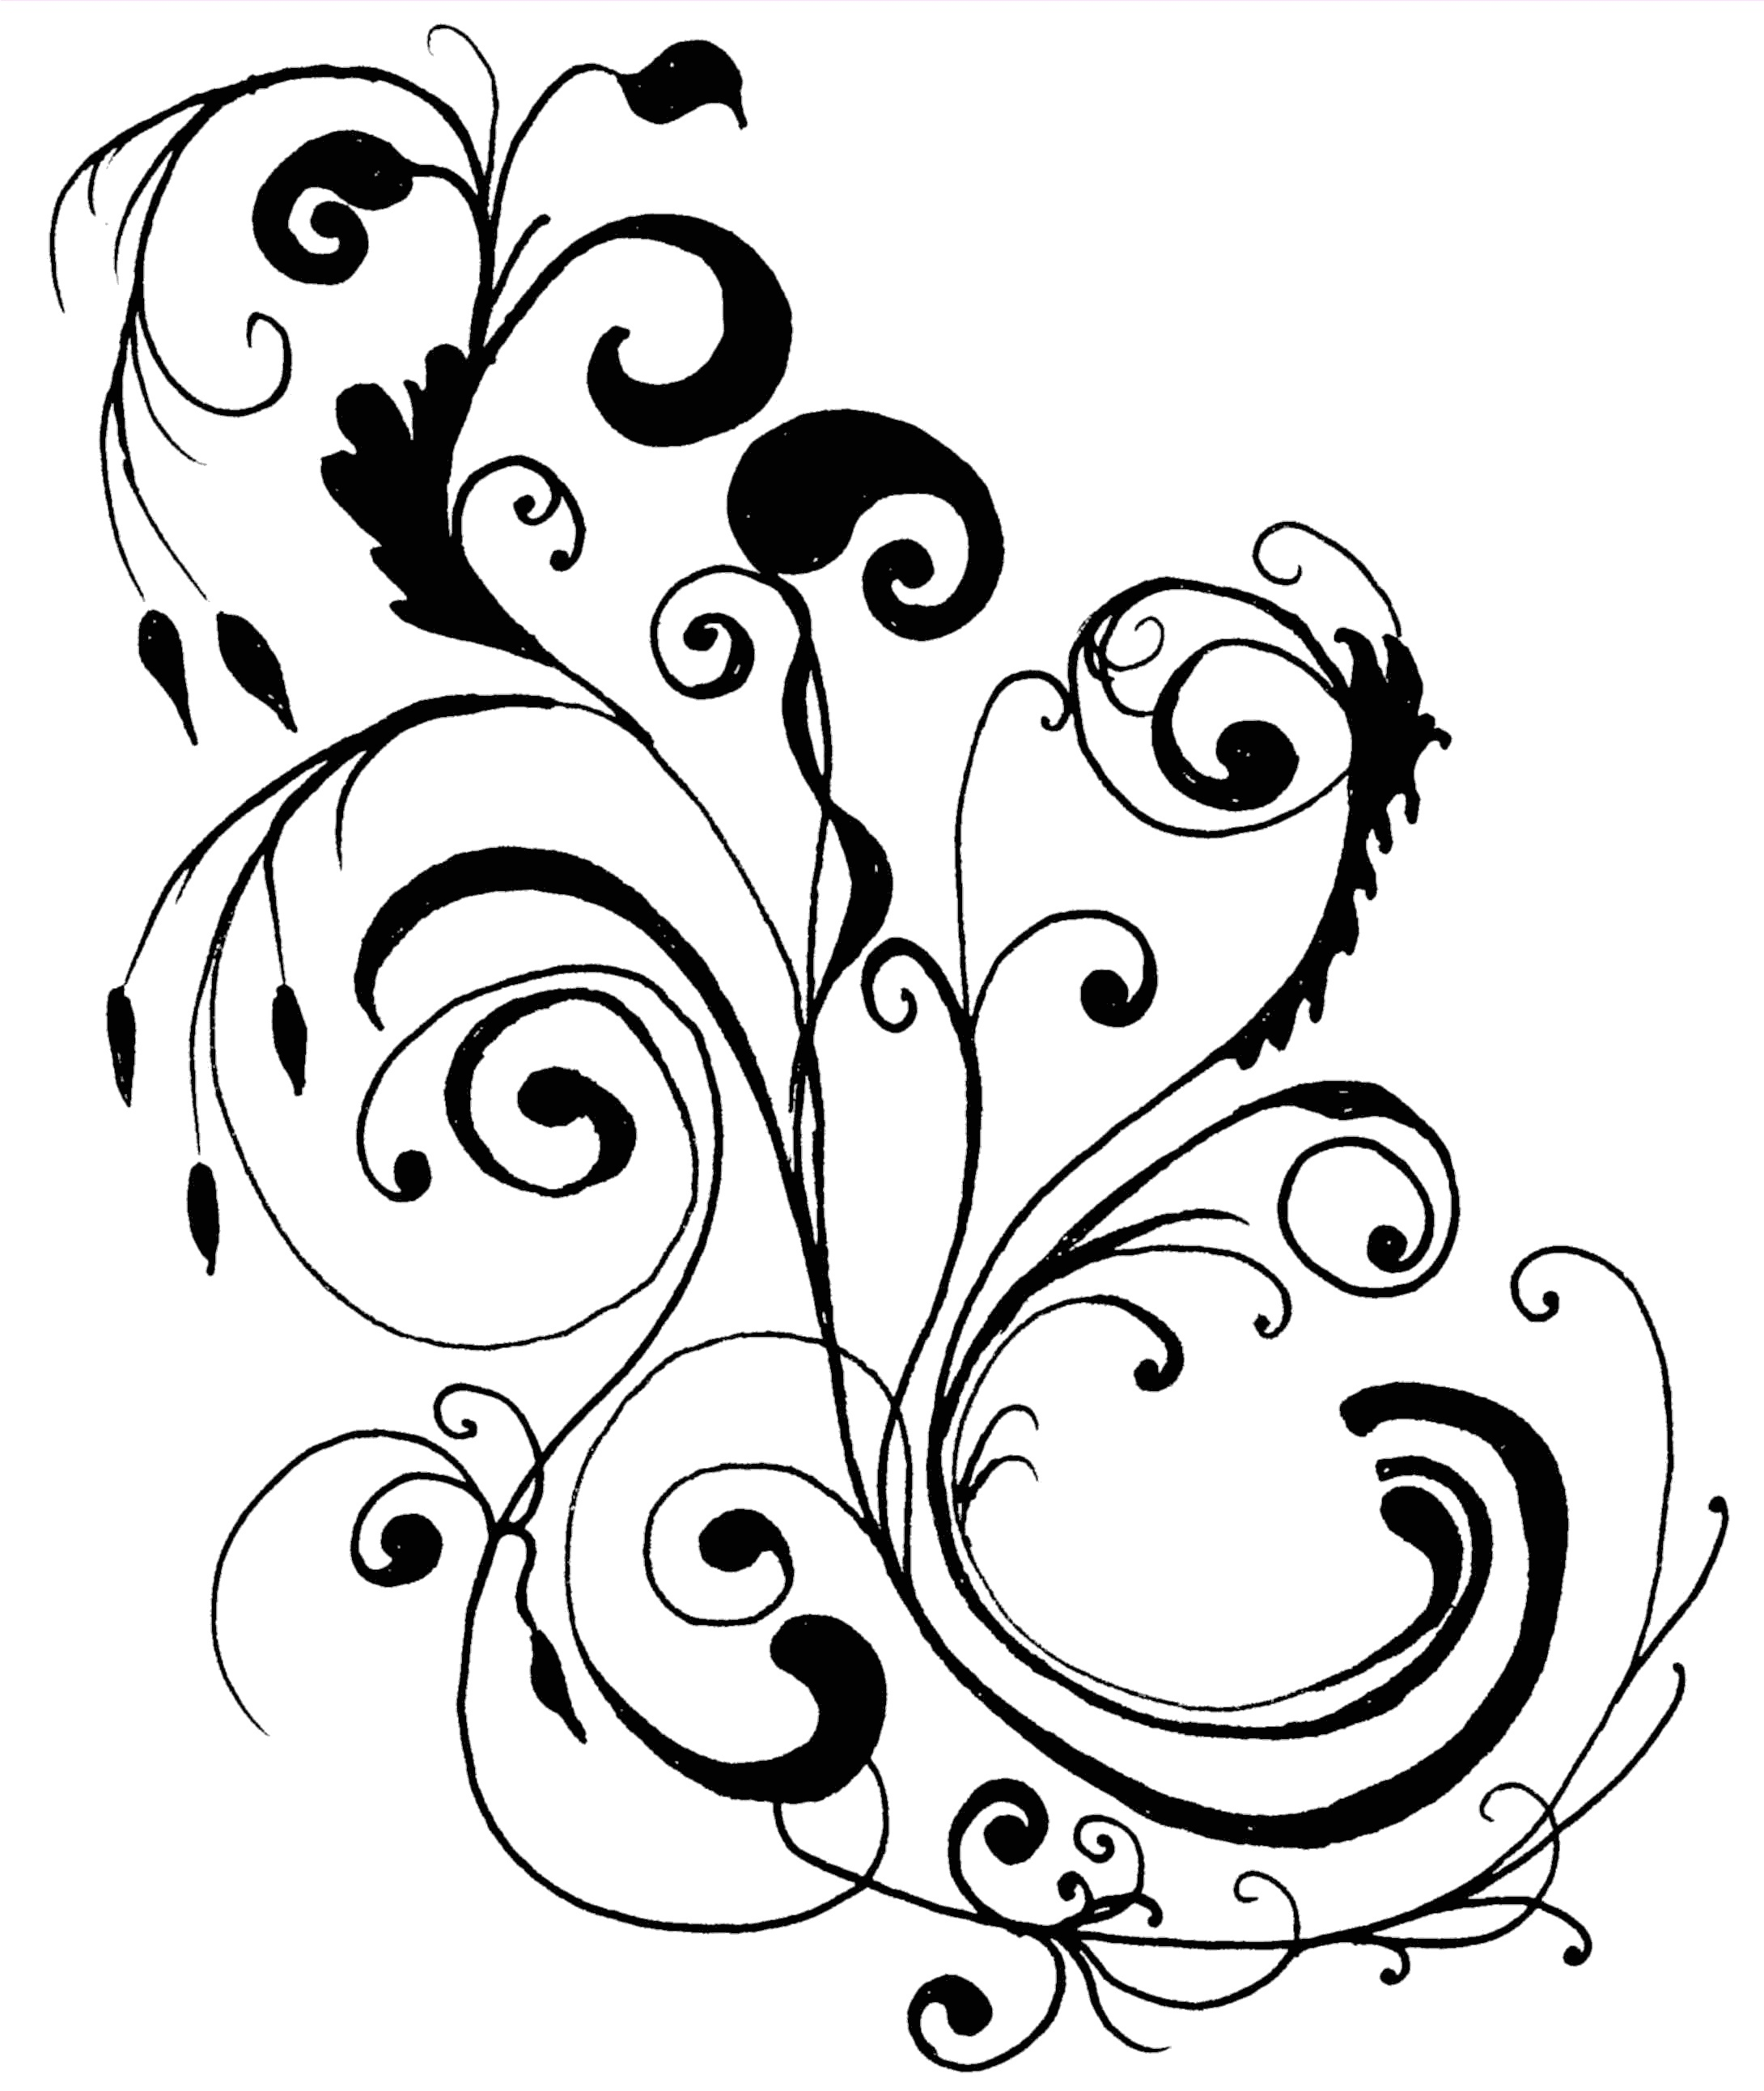 Clipart modern design graphic Free Flower Designing Art, Download Free Clip Art, Free Clip Art on ... graphic